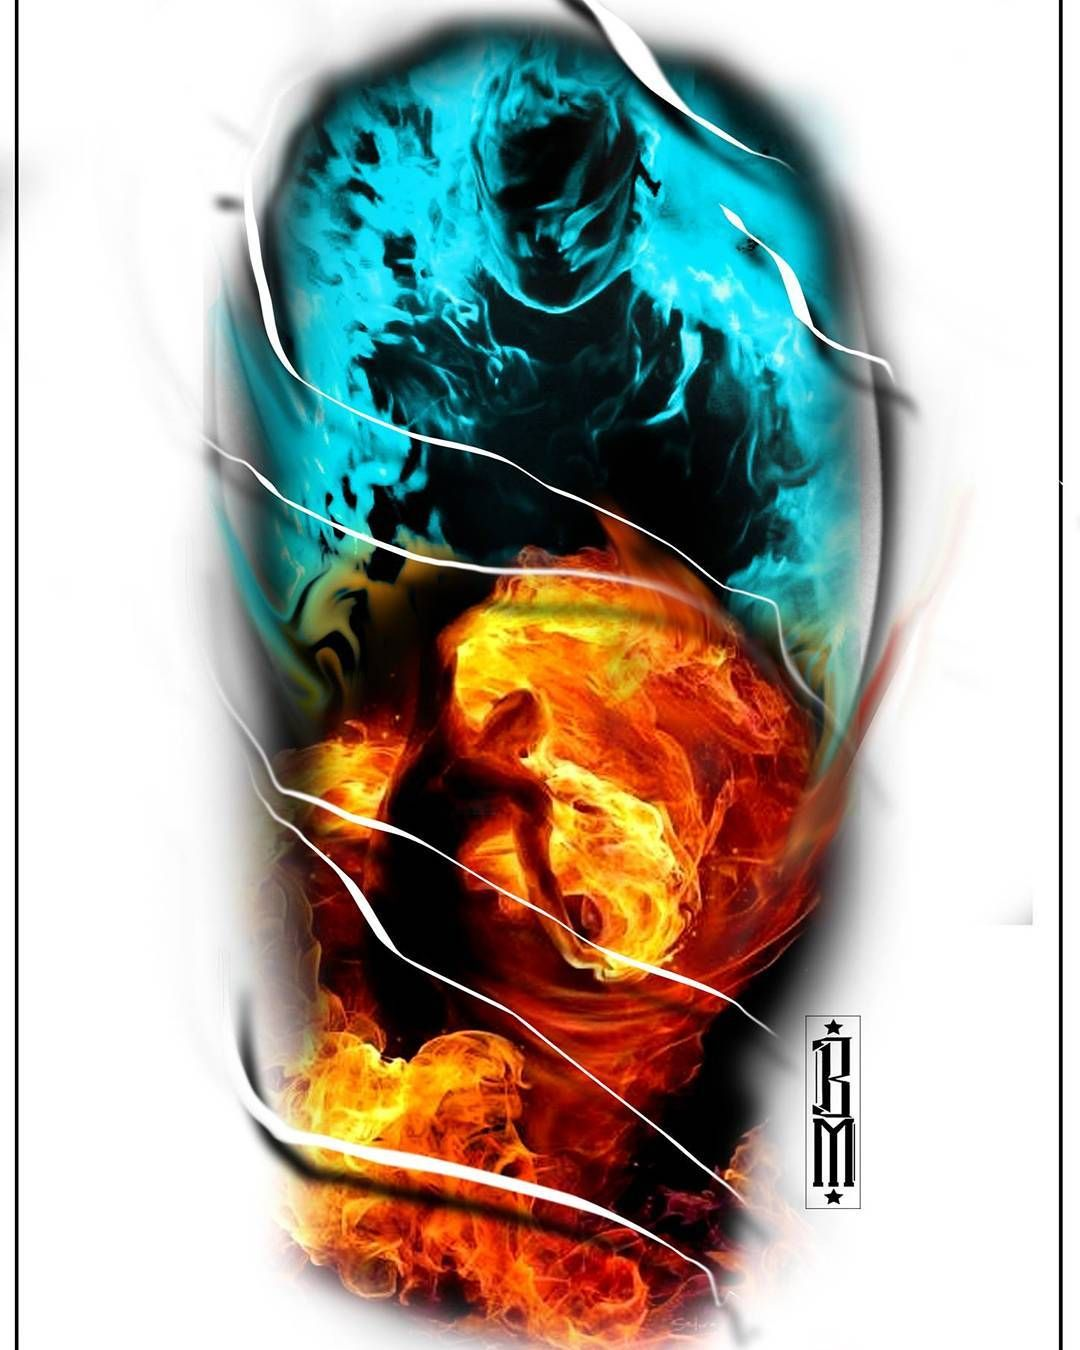 Tattoo background shading ideas color tattoo fire ice calf design colour  tattoos  realismo